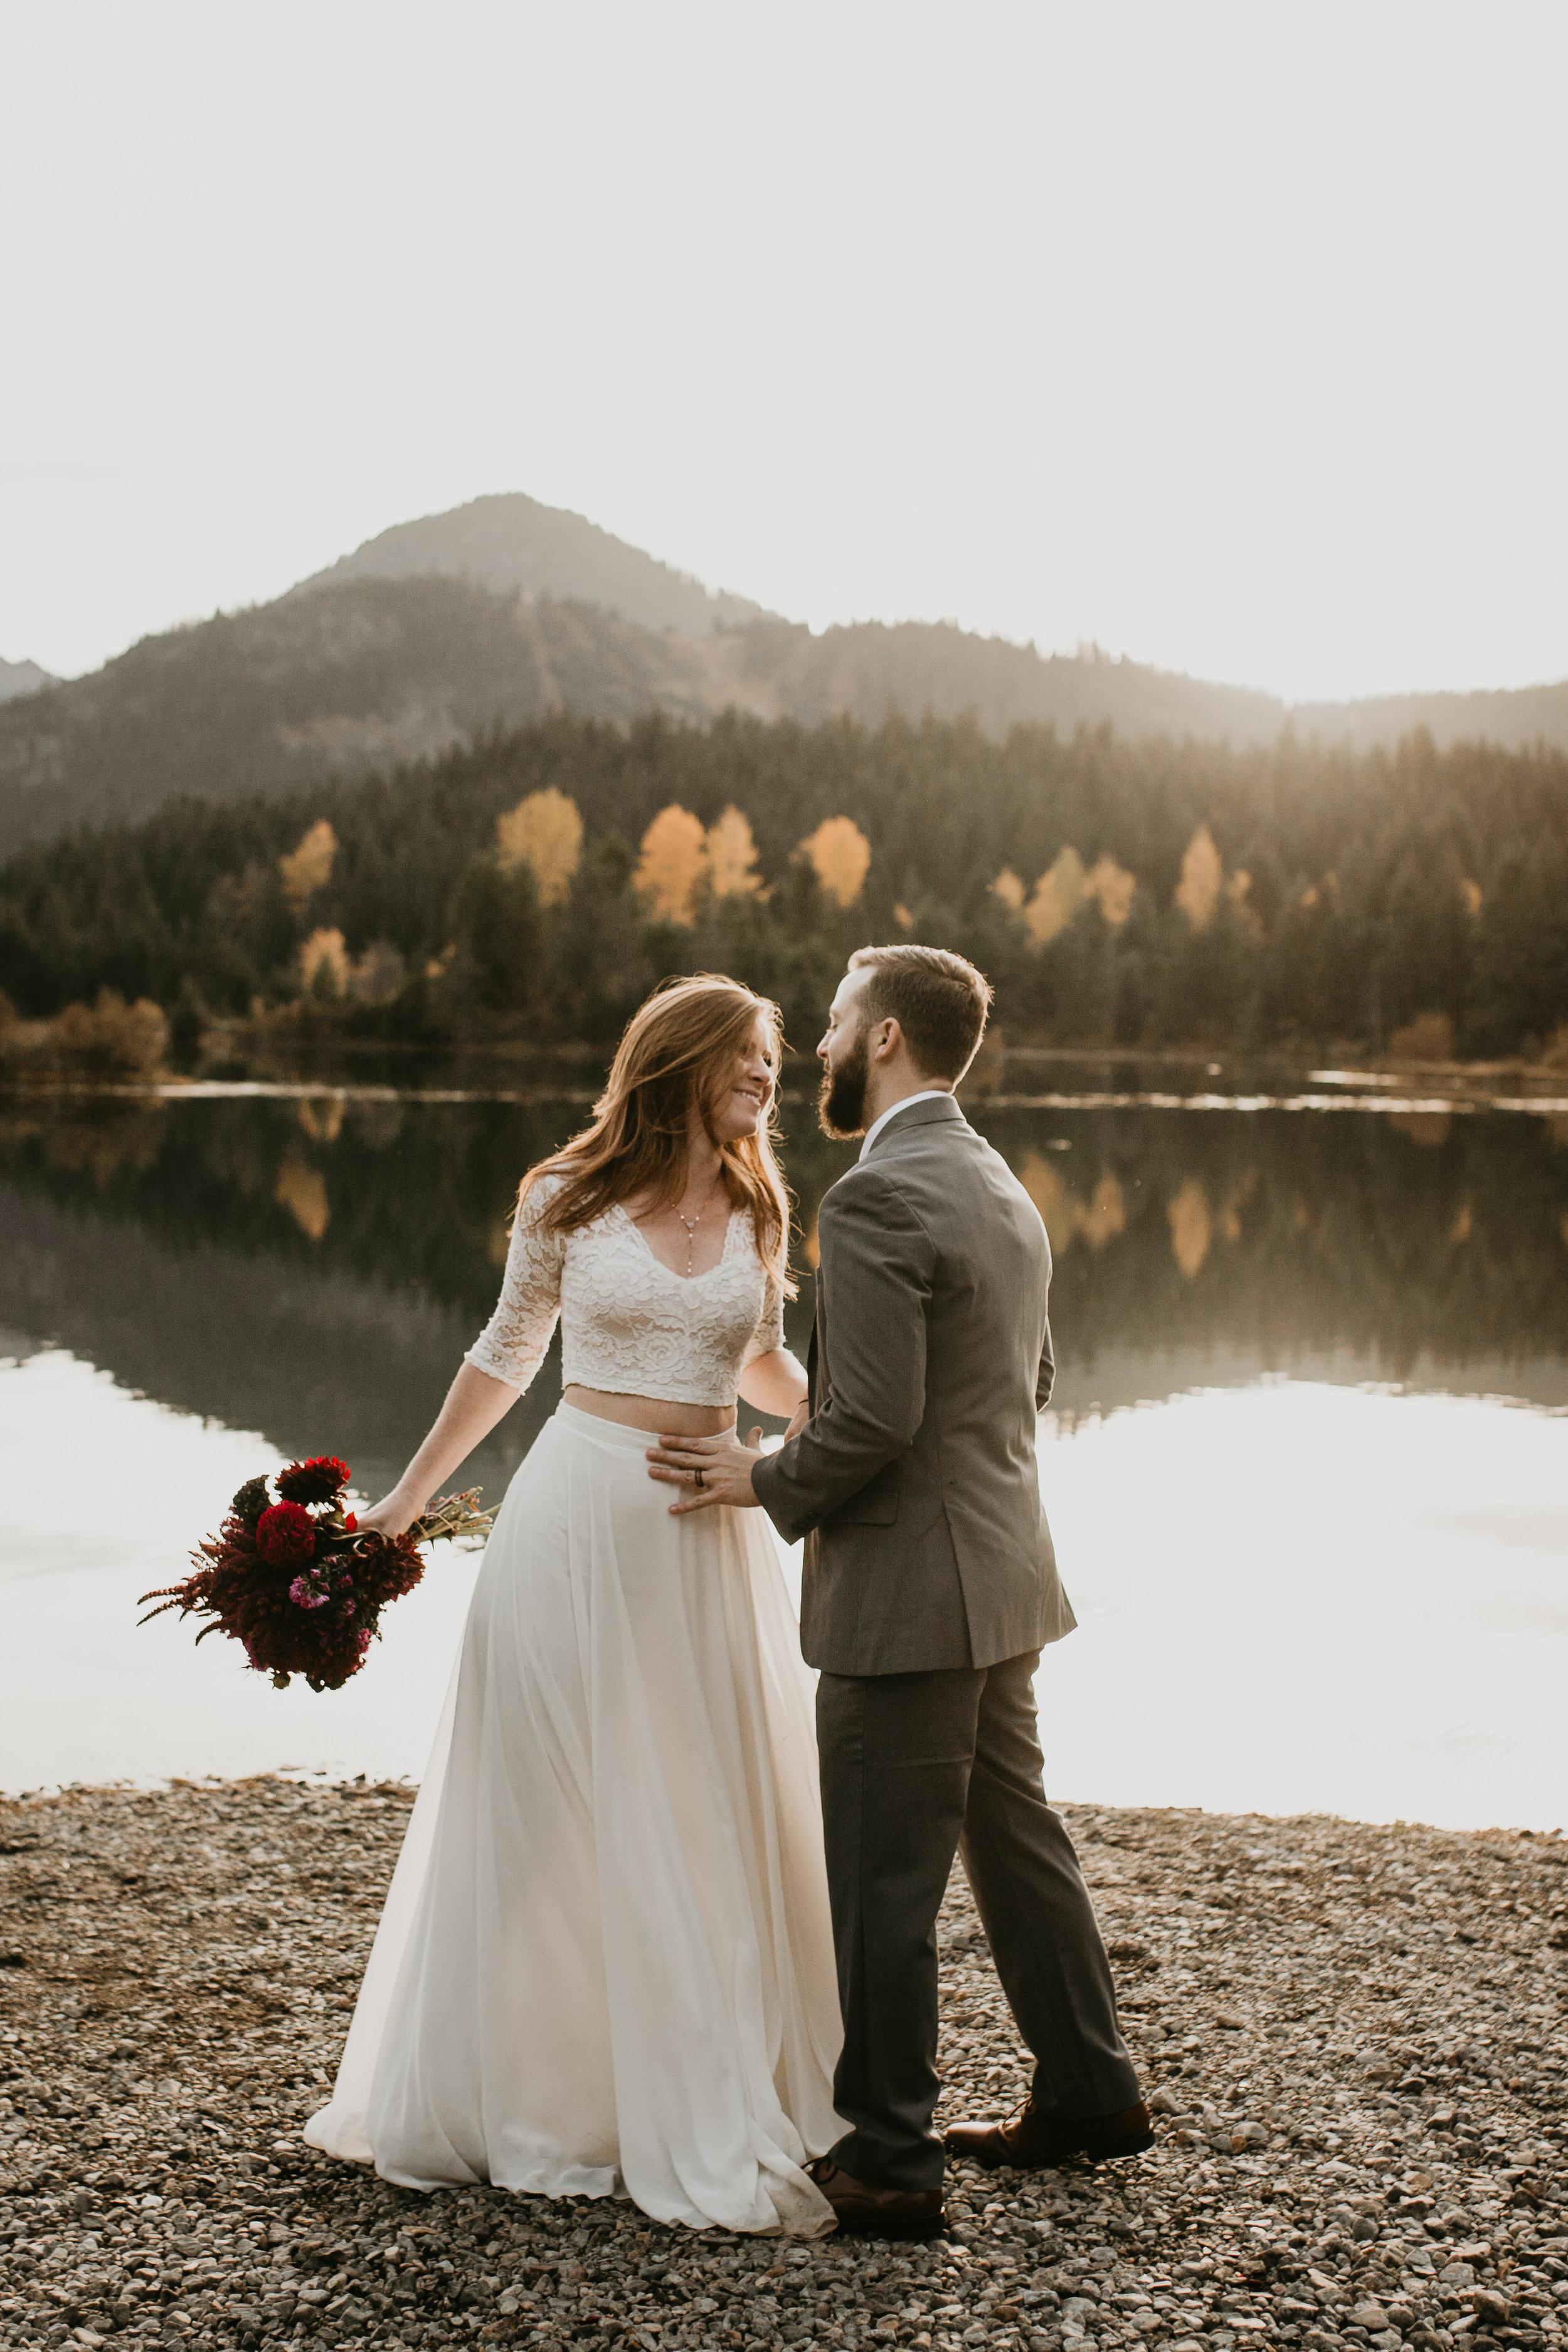 nicole-daacke-photography-mountain-view-elopement-at-gold-creek-pond-snoqualmie-washington-wa-elopement-photographer-photography-adventure-elopement-in-washington-fall-lakeside-golden-sunset-boho-fun-bride-0357.jpg